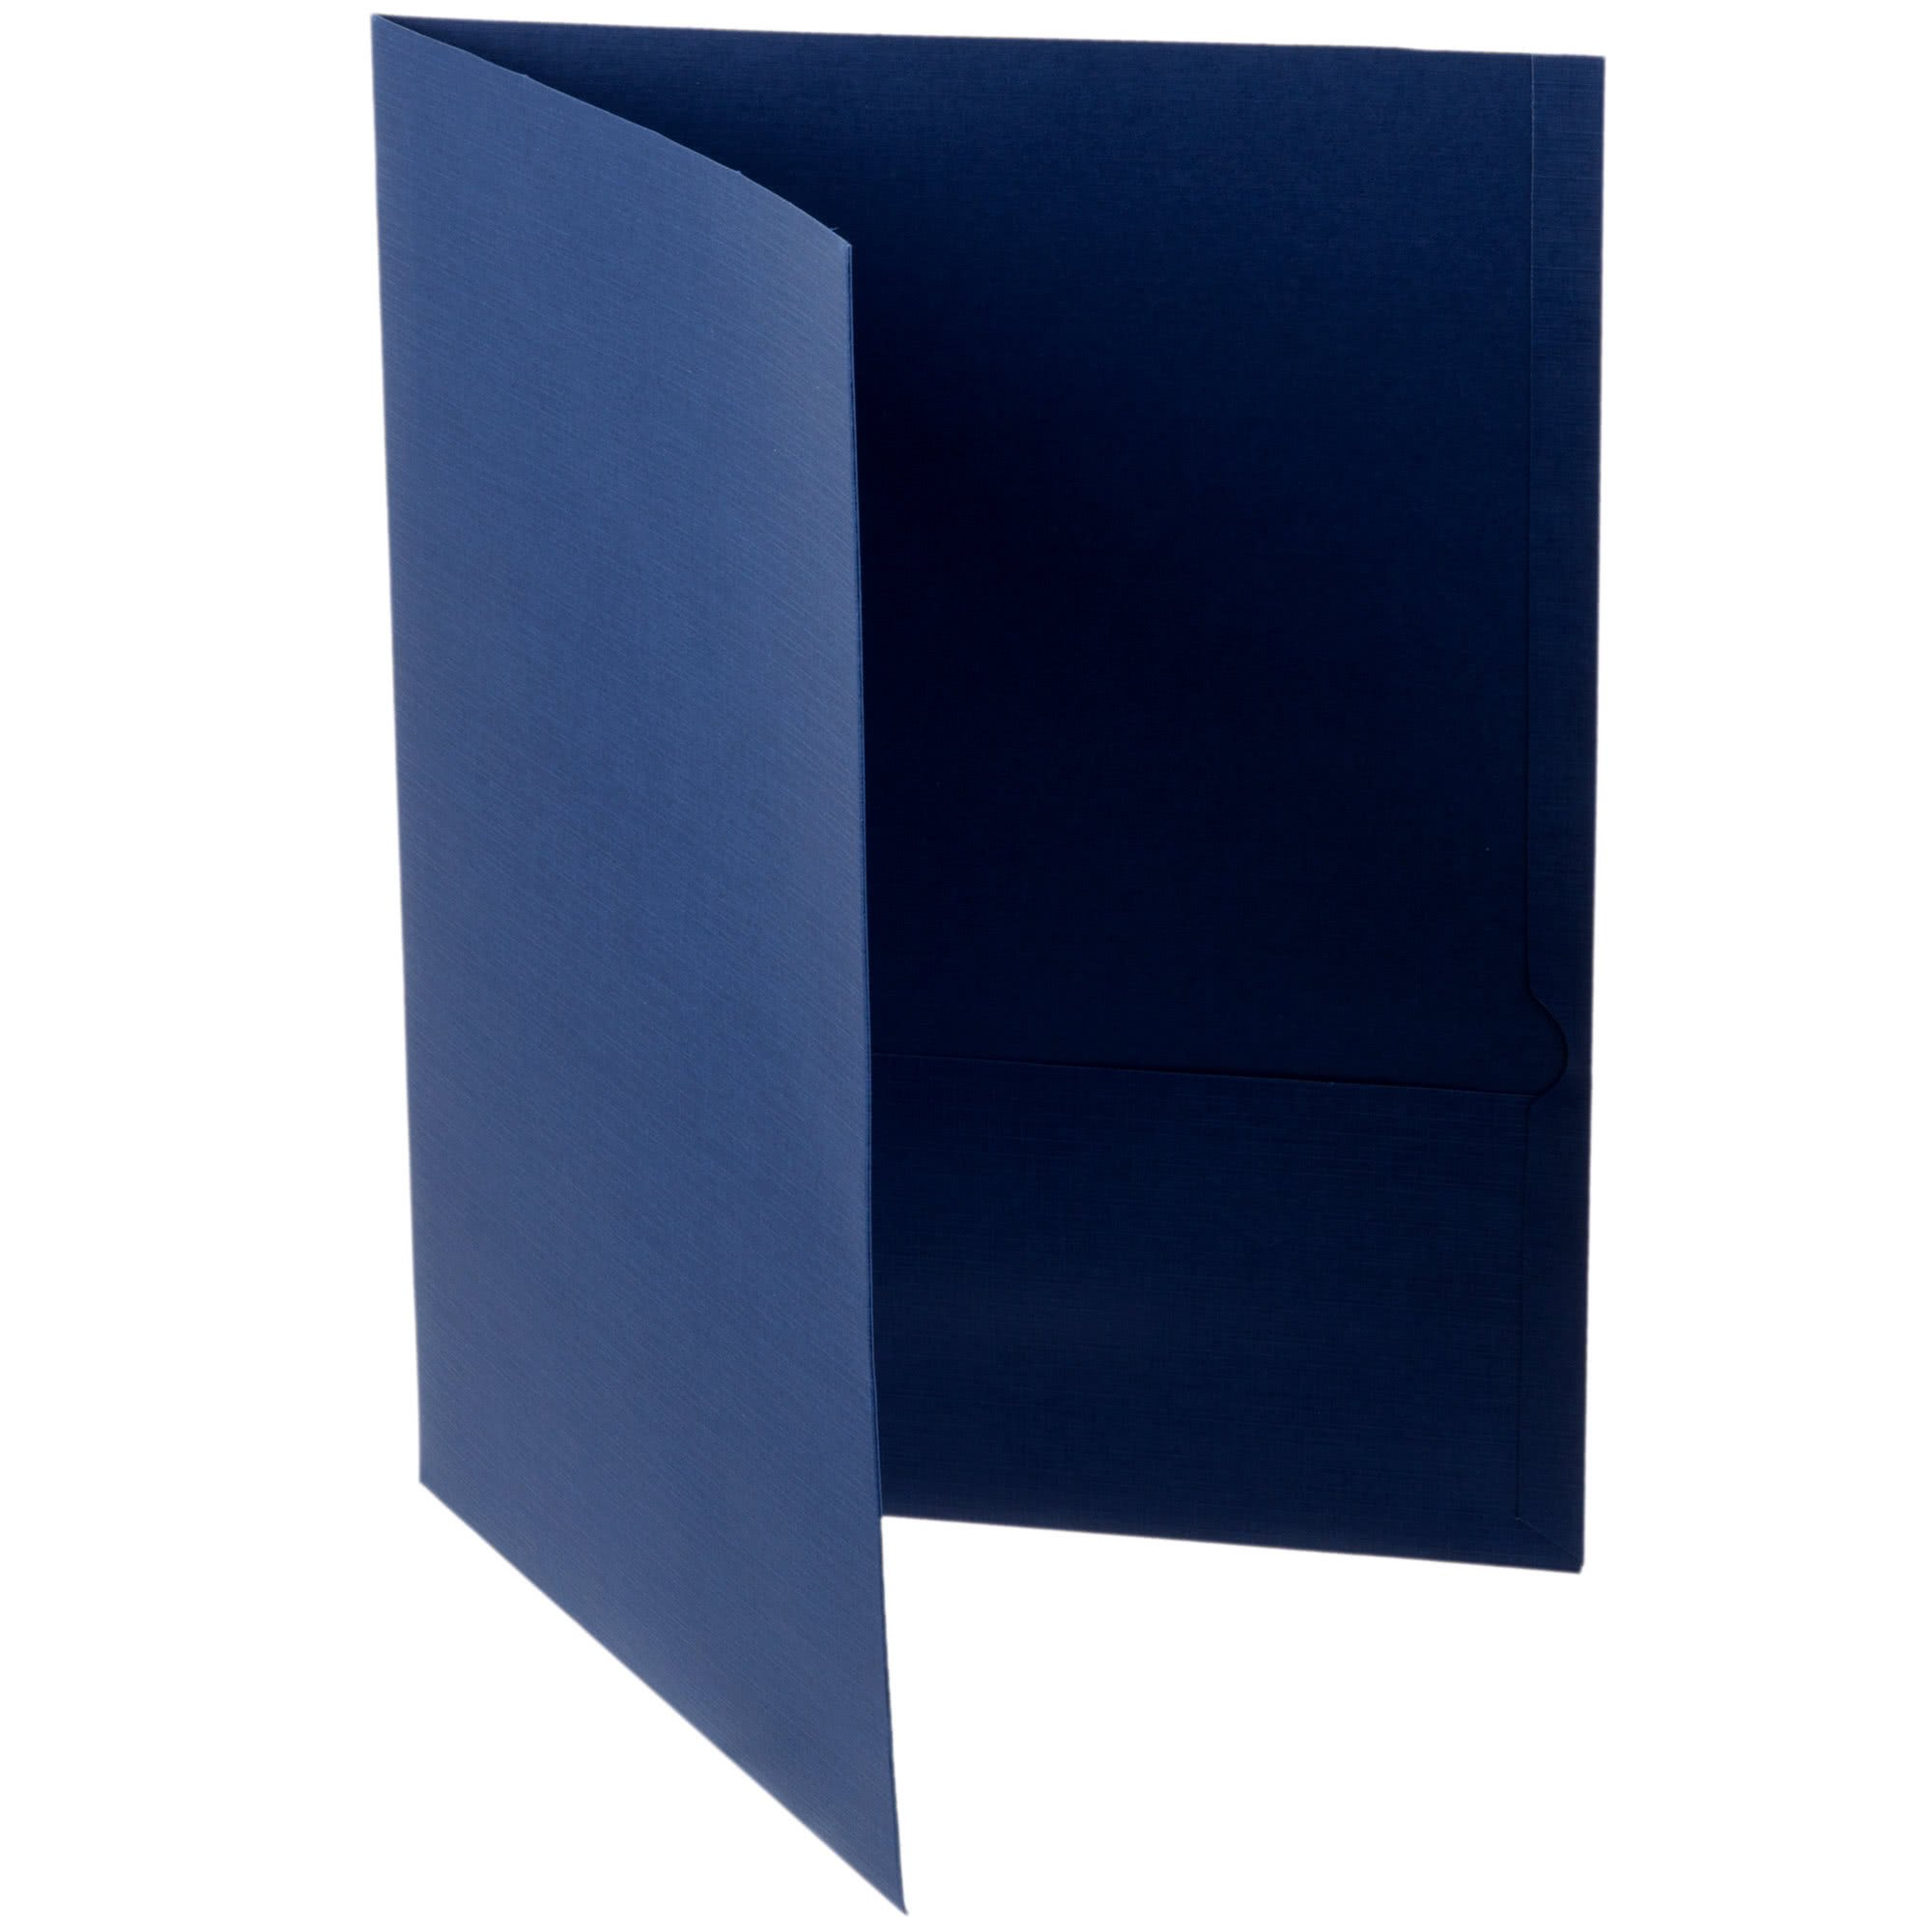 TableTop King 53443 Letter Size 2-Pocket Linen Finish Paper Pocket Folder Navy Blue - 25/Box